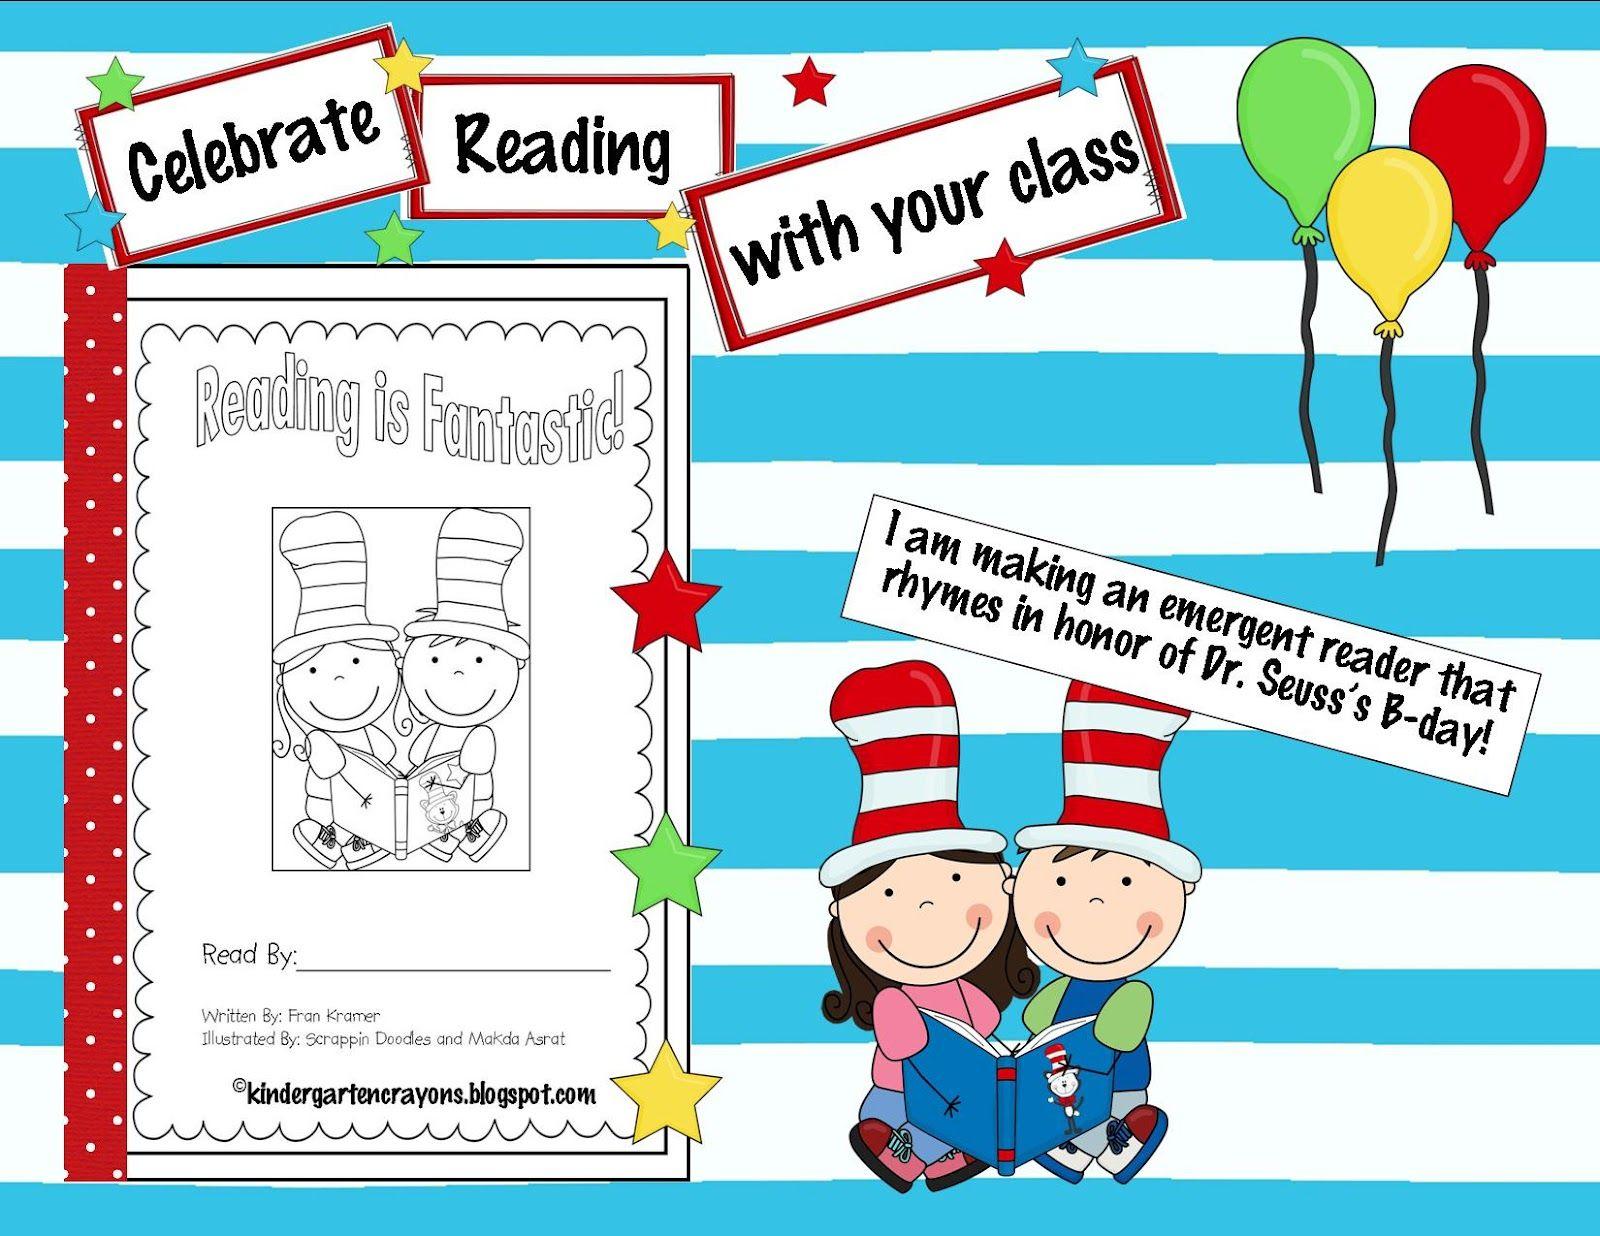 Kindergarten Crayons Another Birthday Celebration Birthday Card Template Kindergarten Crayons Dr Seuss Rhymes